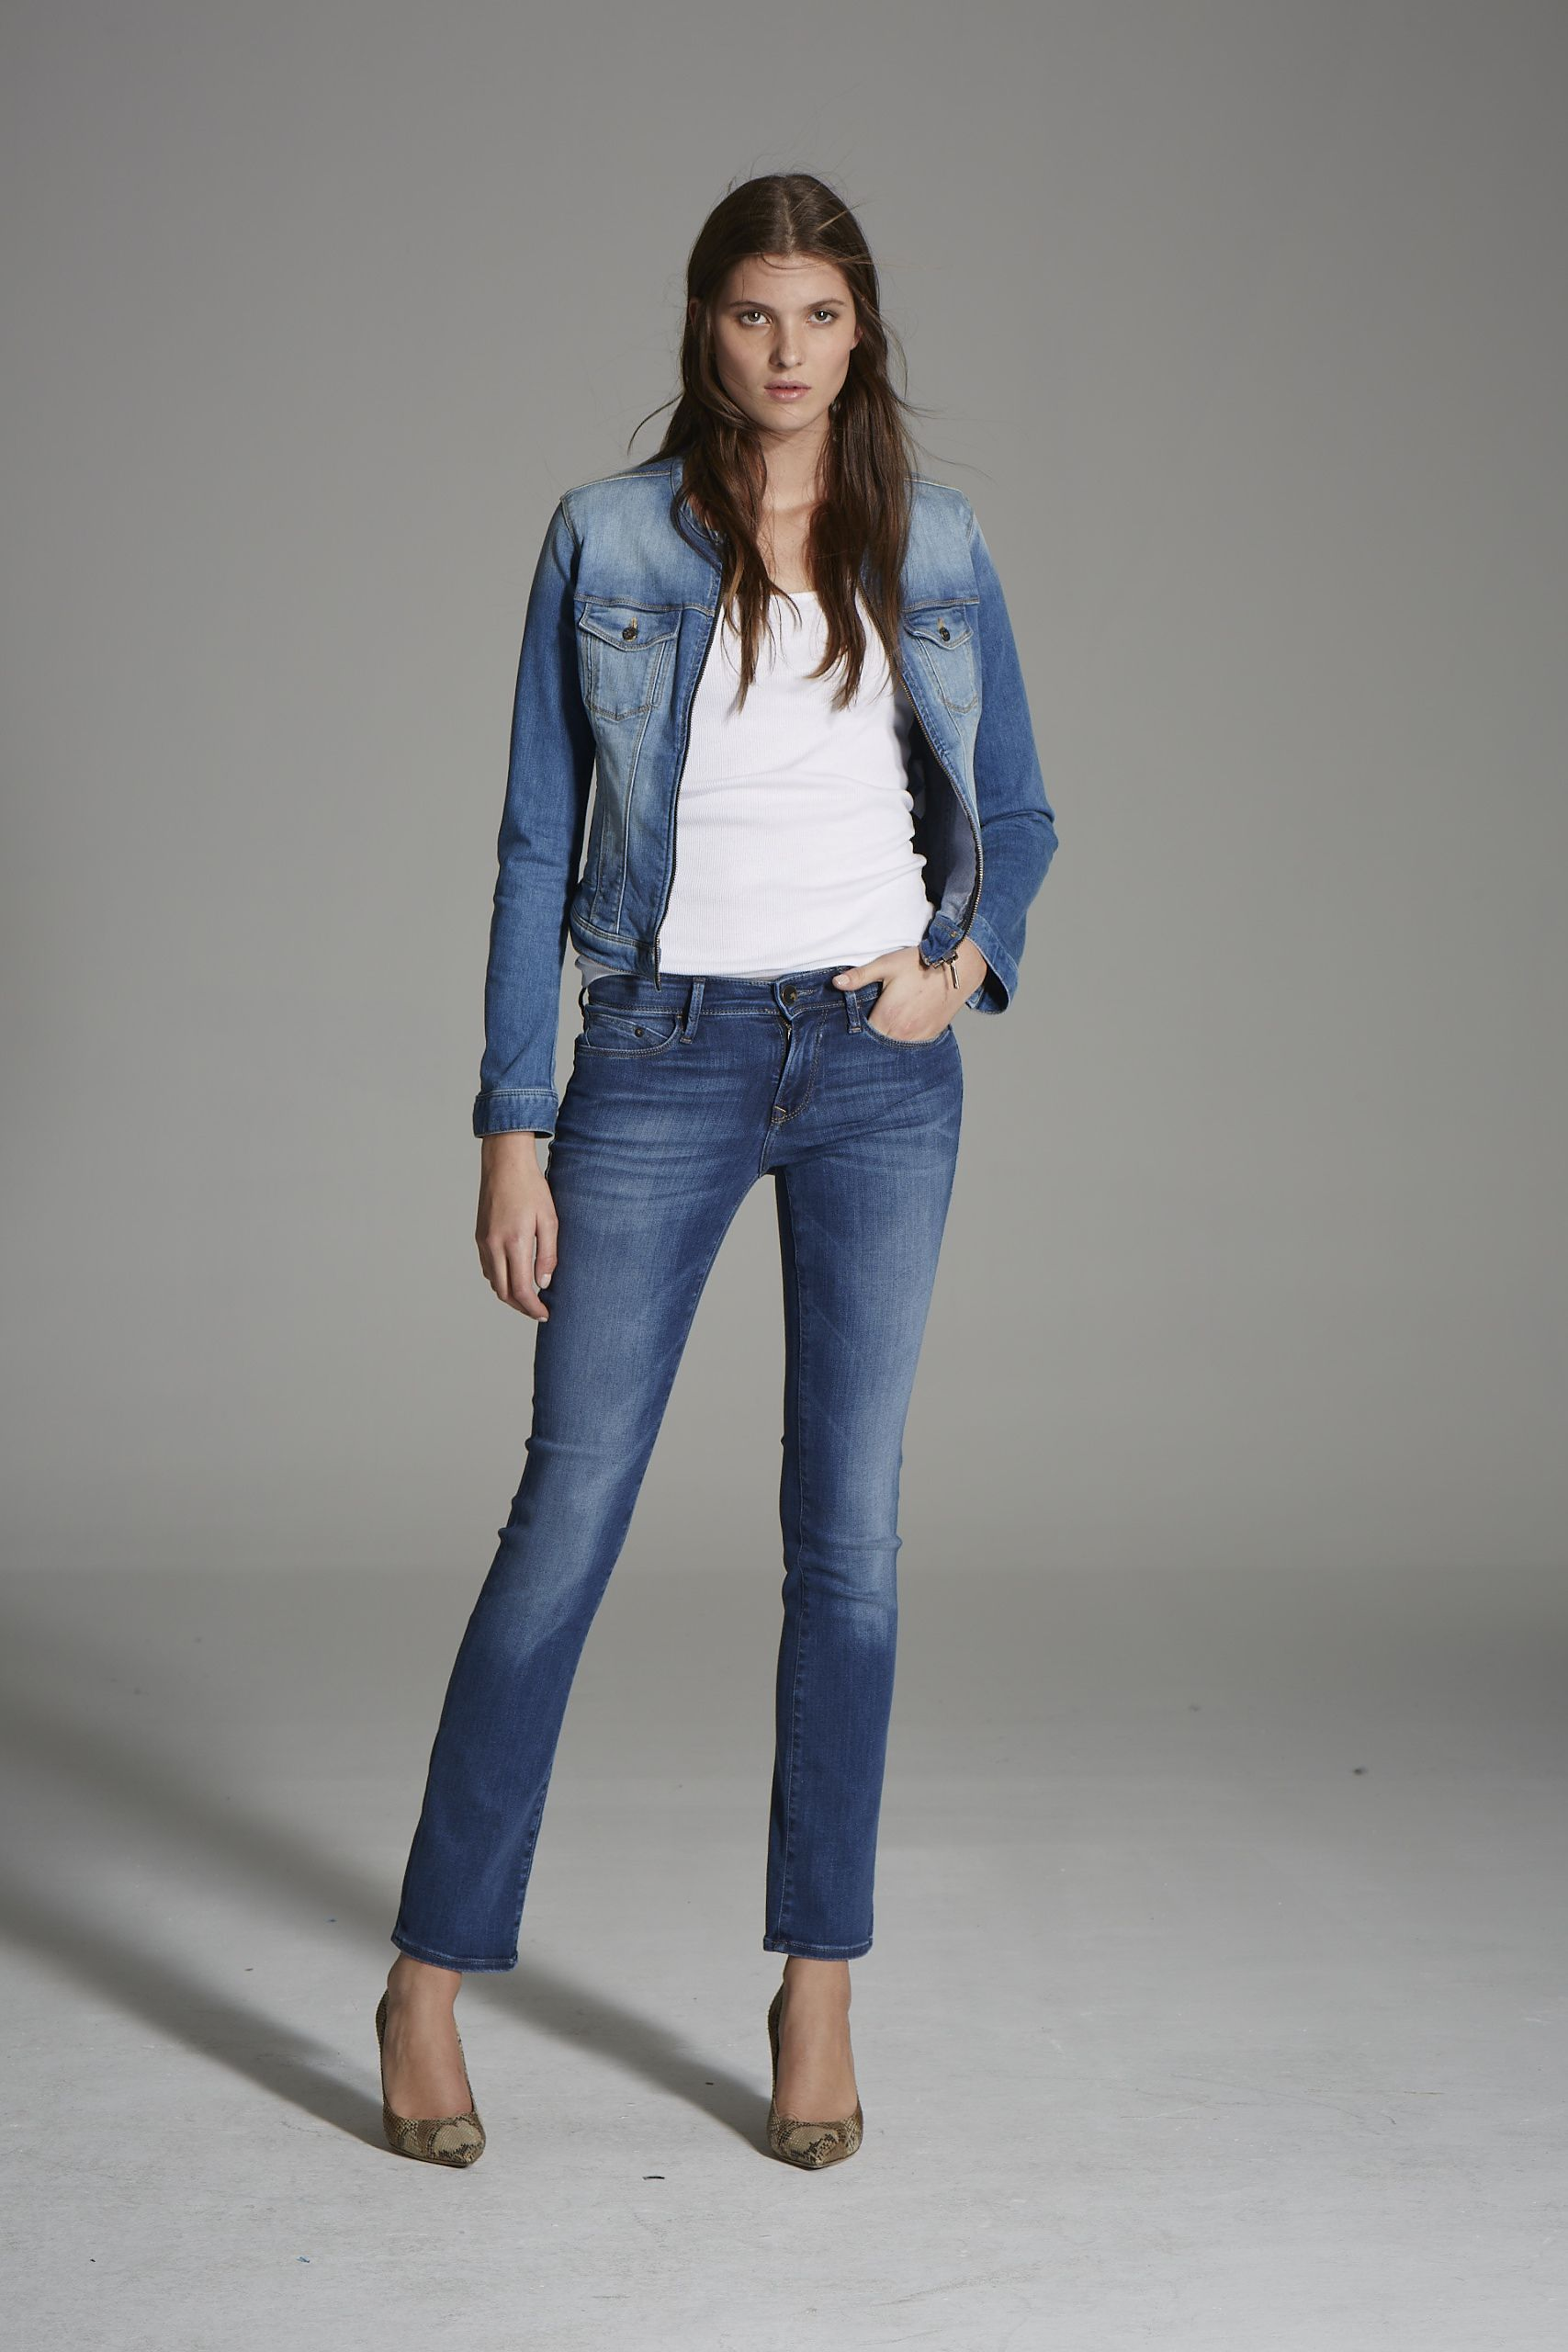 Mavi Claire Denim Jacket + Kerry Straight Leg Jeans | http://us.